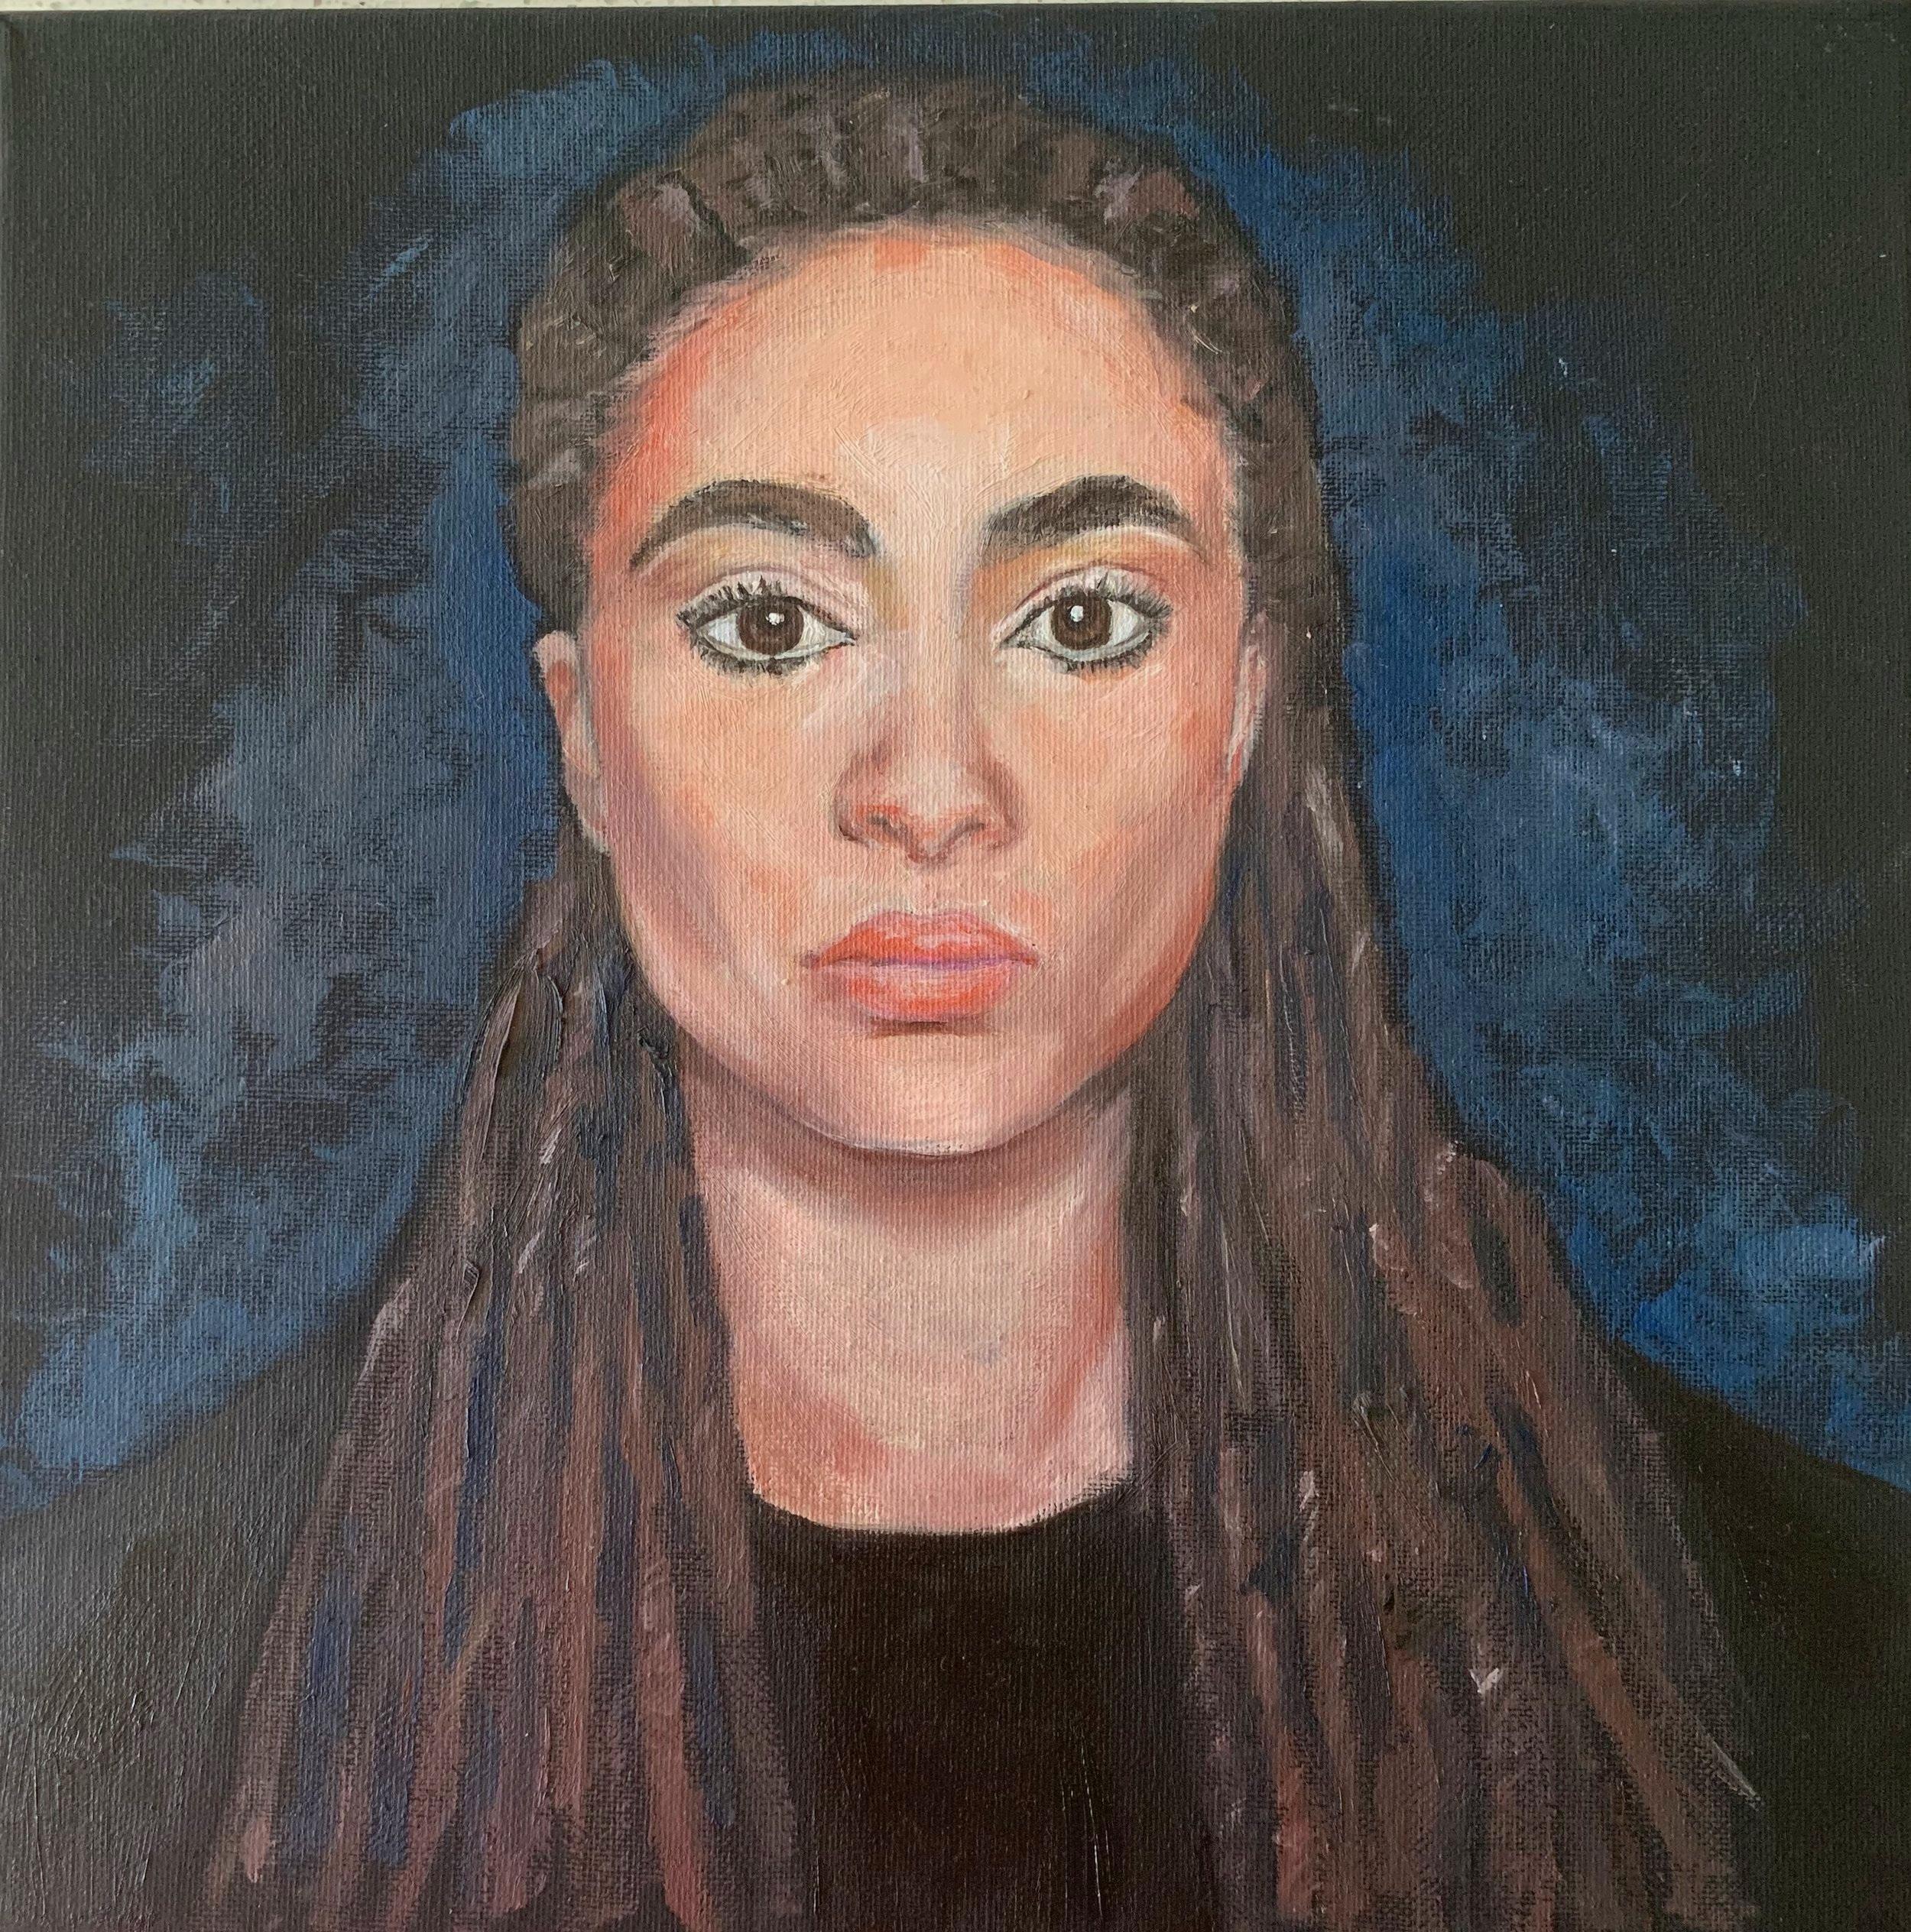 10 x 10 oil on black canvas